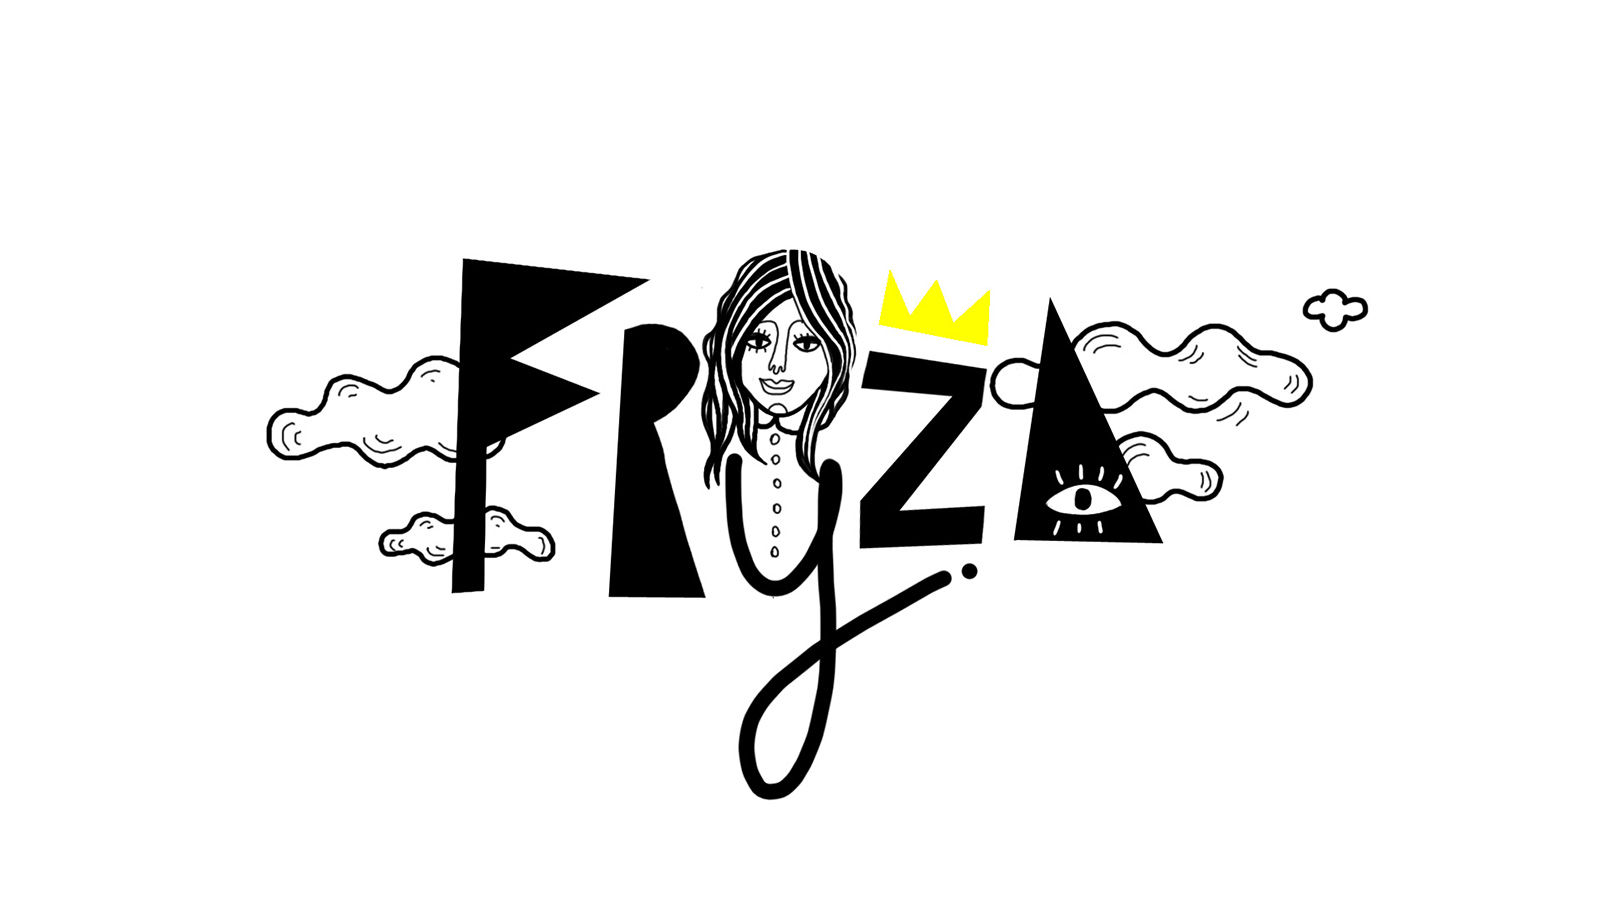 fryza, animation, animacja, ilustracja, kasia ksiezopolska, ilustratorka